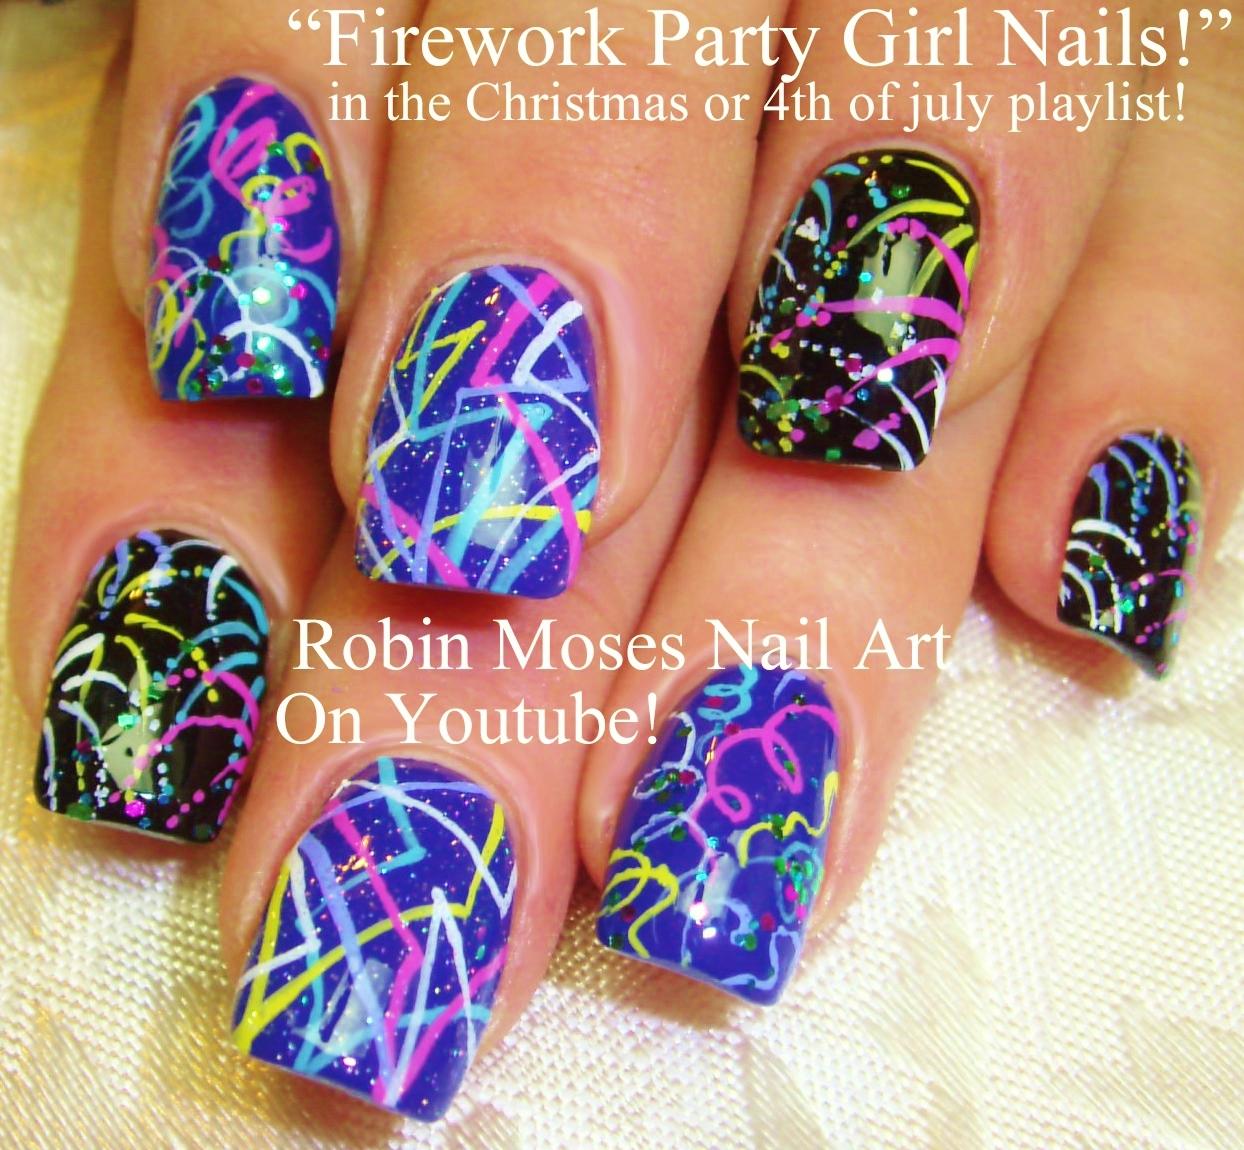 Nail Art by Robin Moses: Romantic Firework Nail Art Design ...